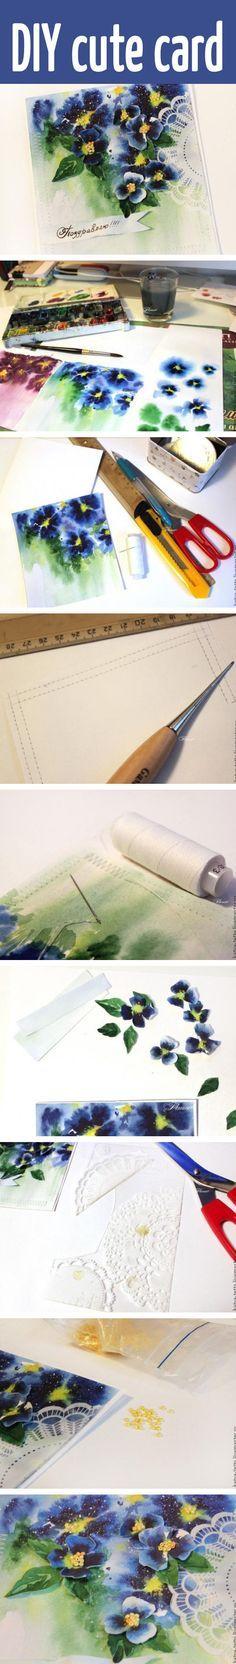 DIY cute watercolor card #scrapbooking